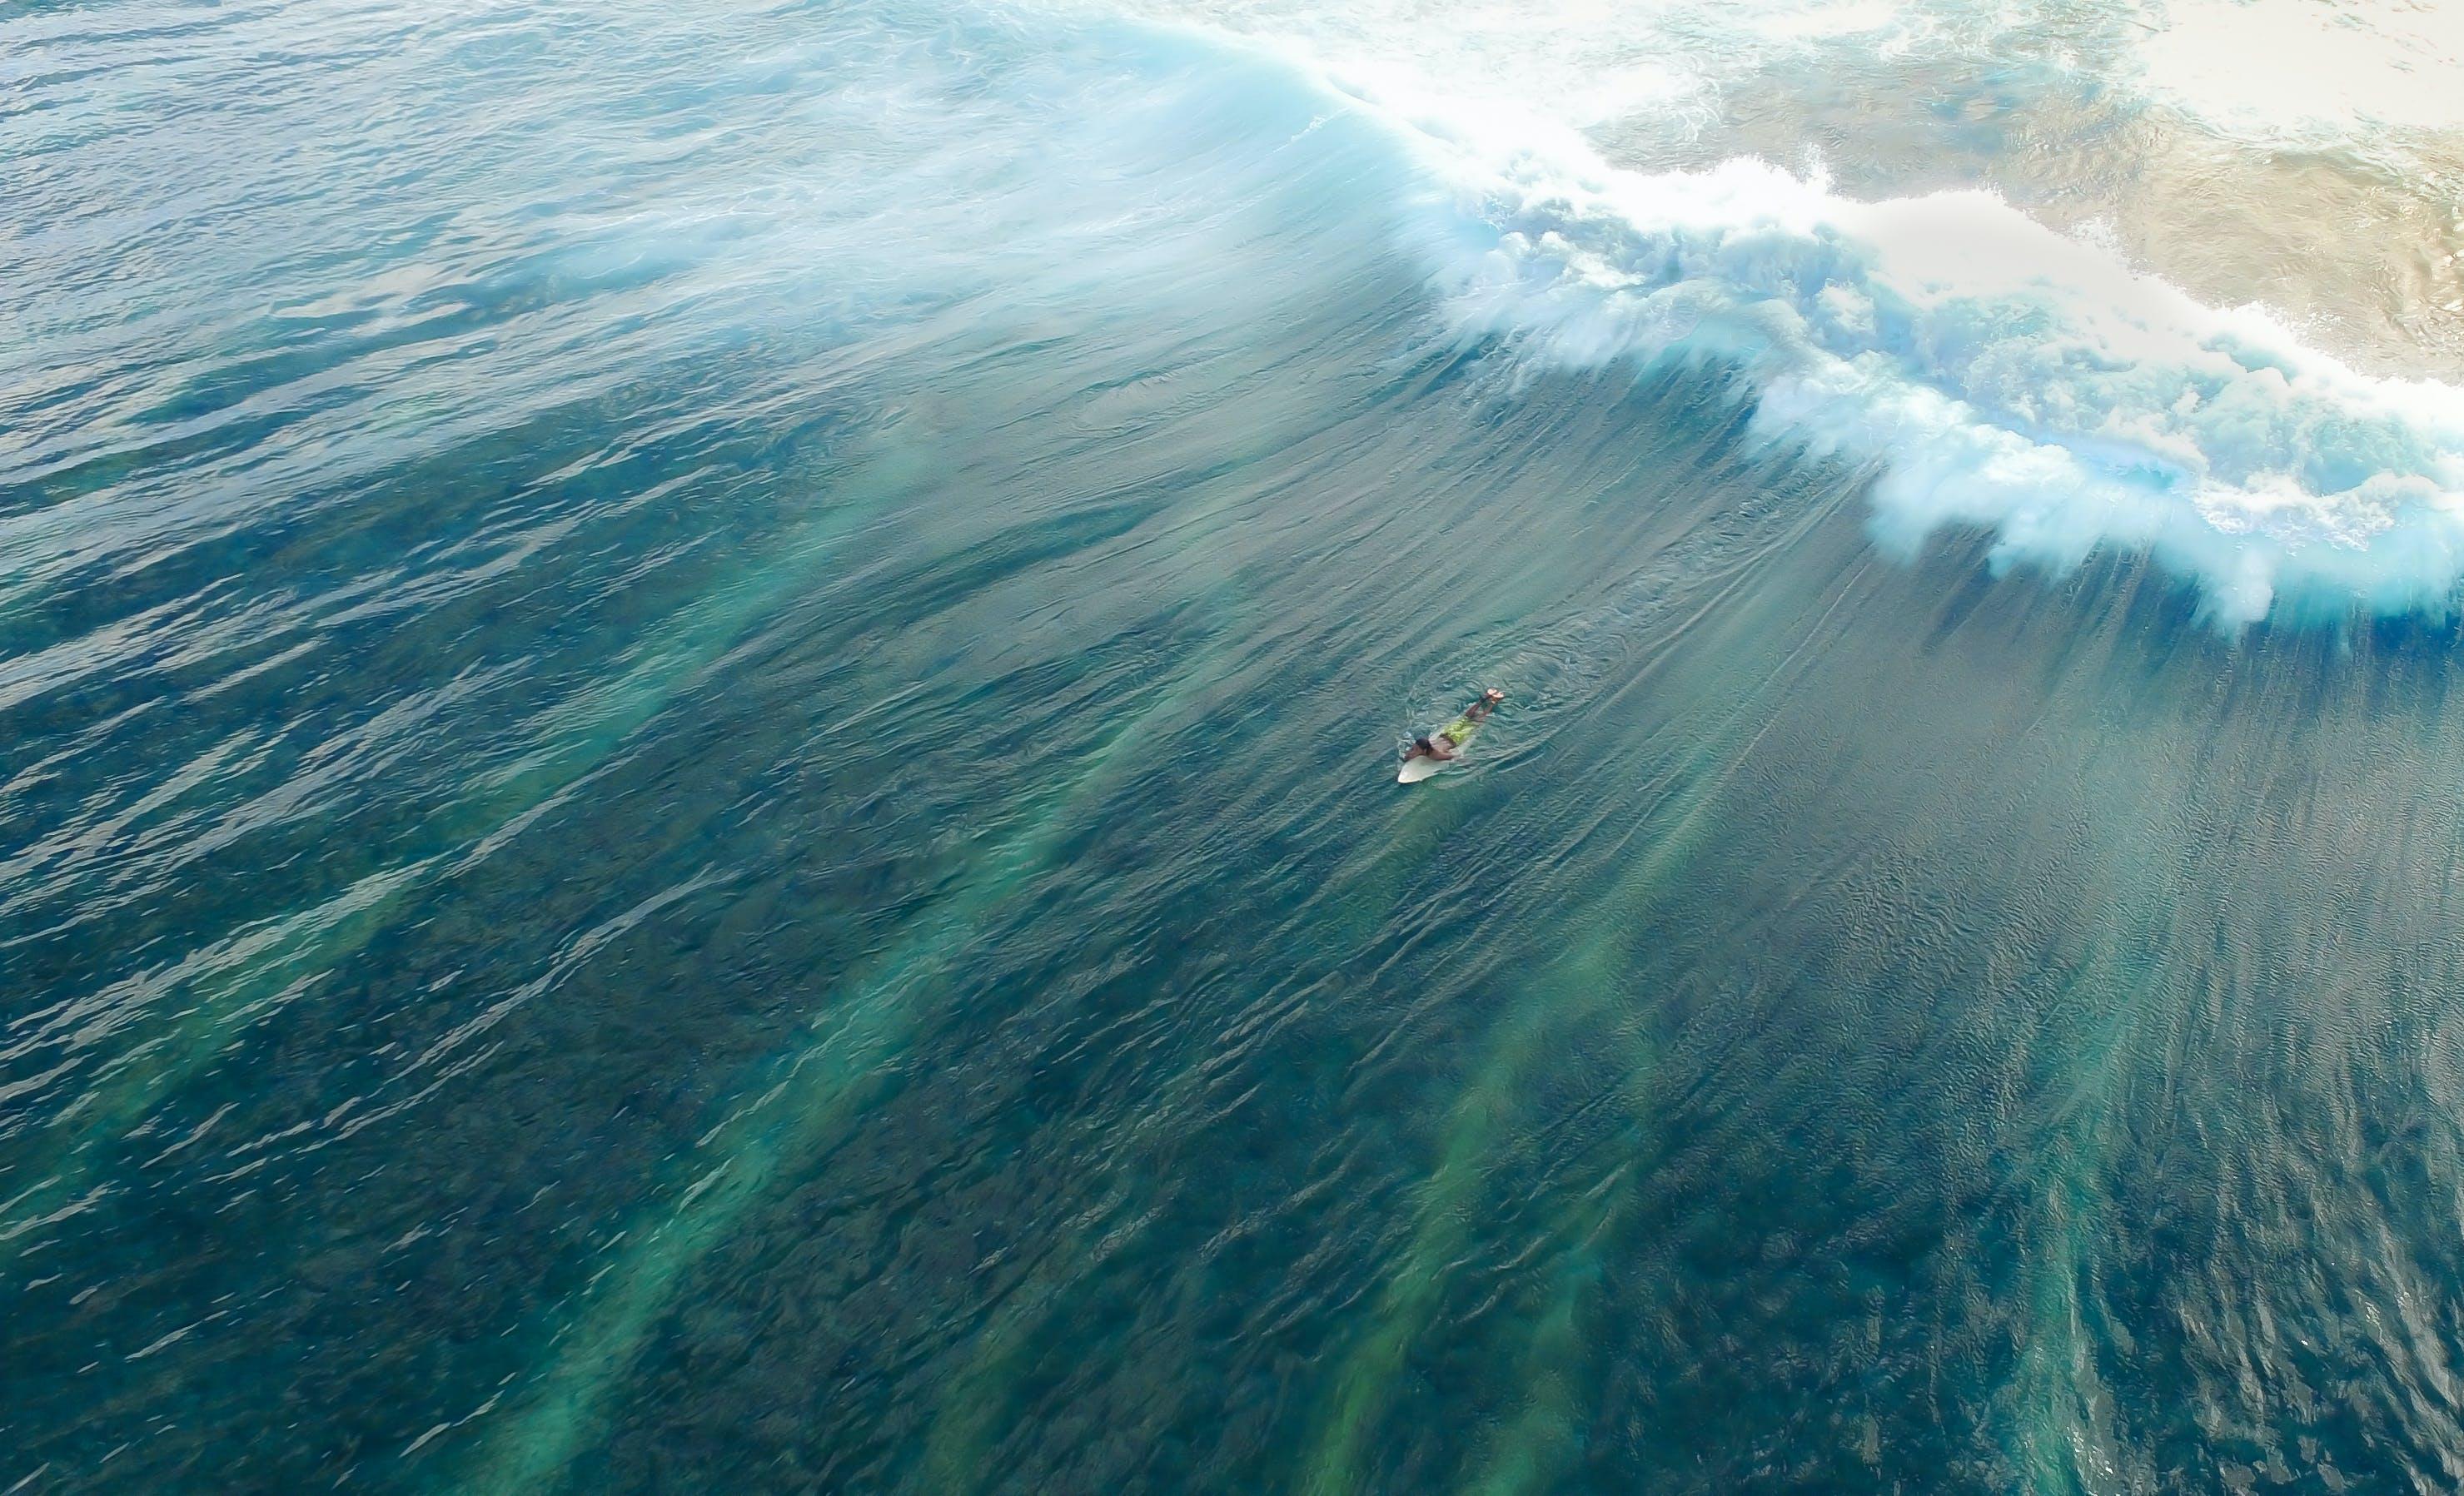 Man on Surfboard Surfing on Wave